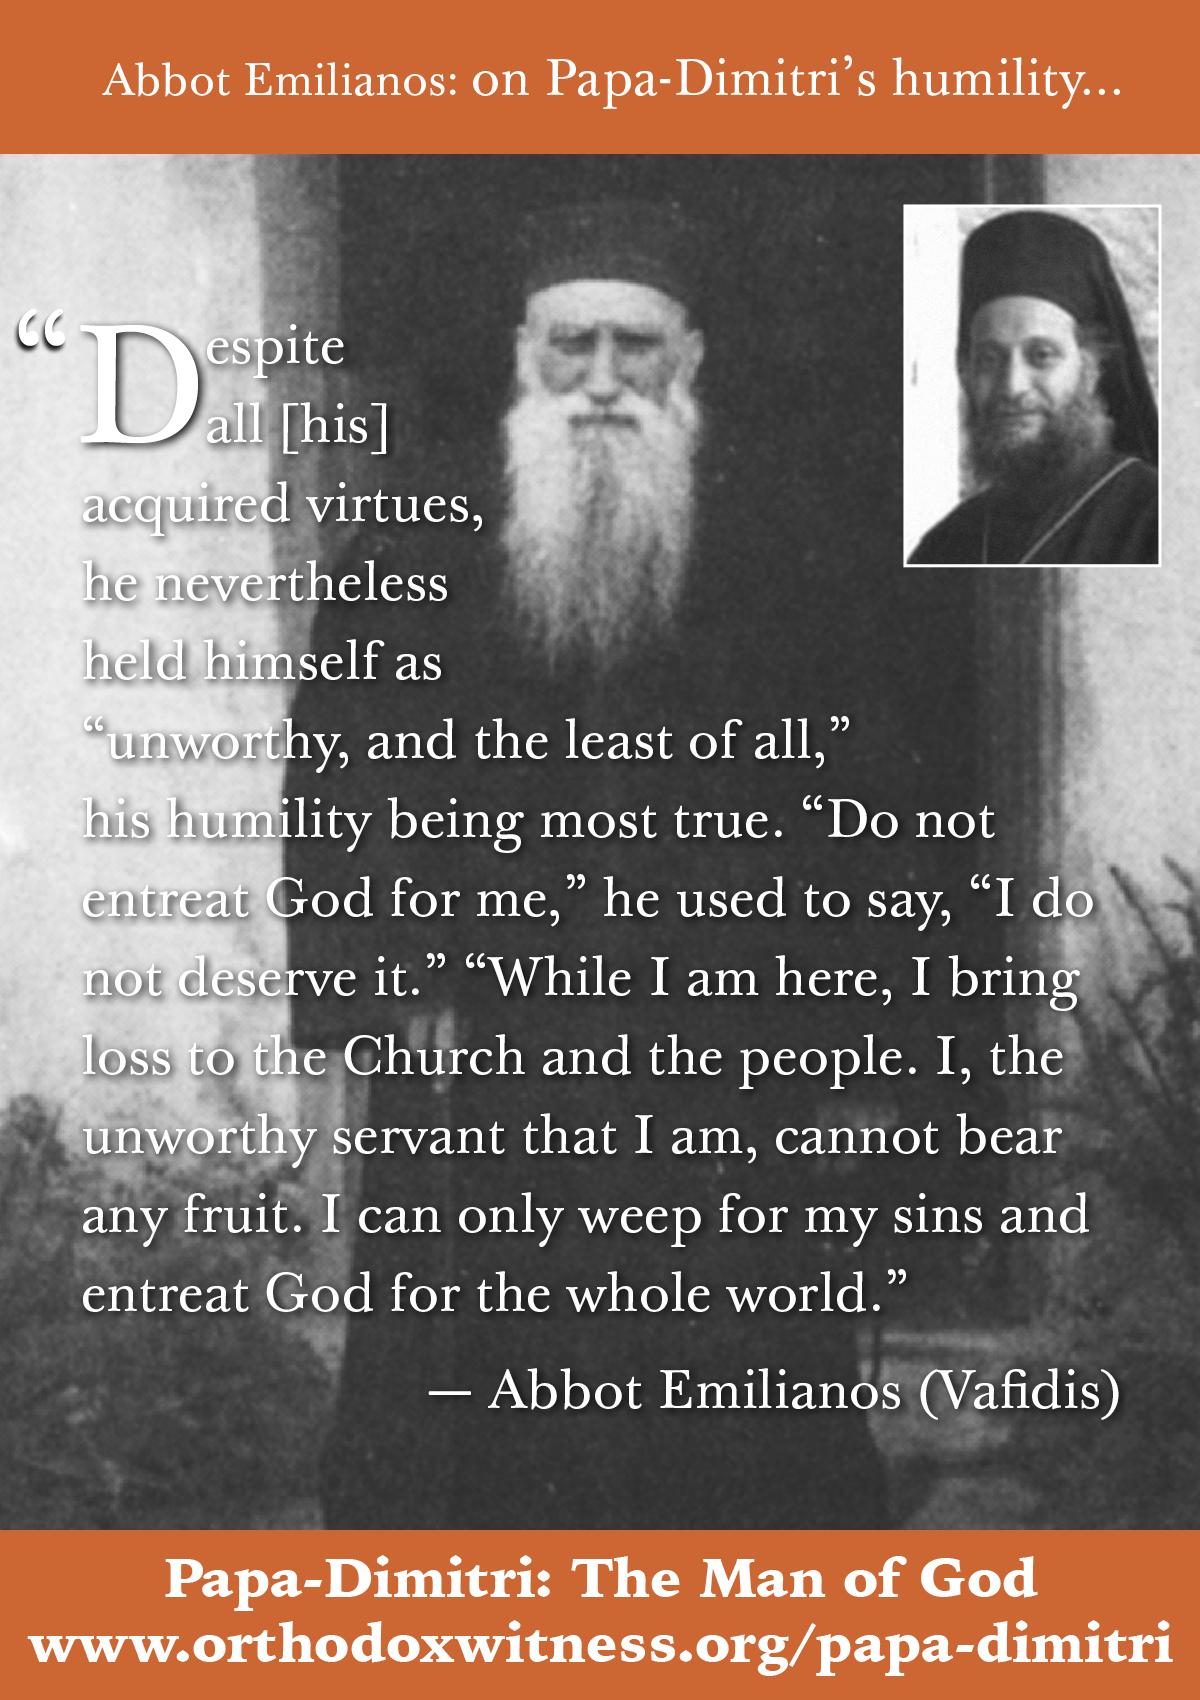 pd-abbot-emilianos-3